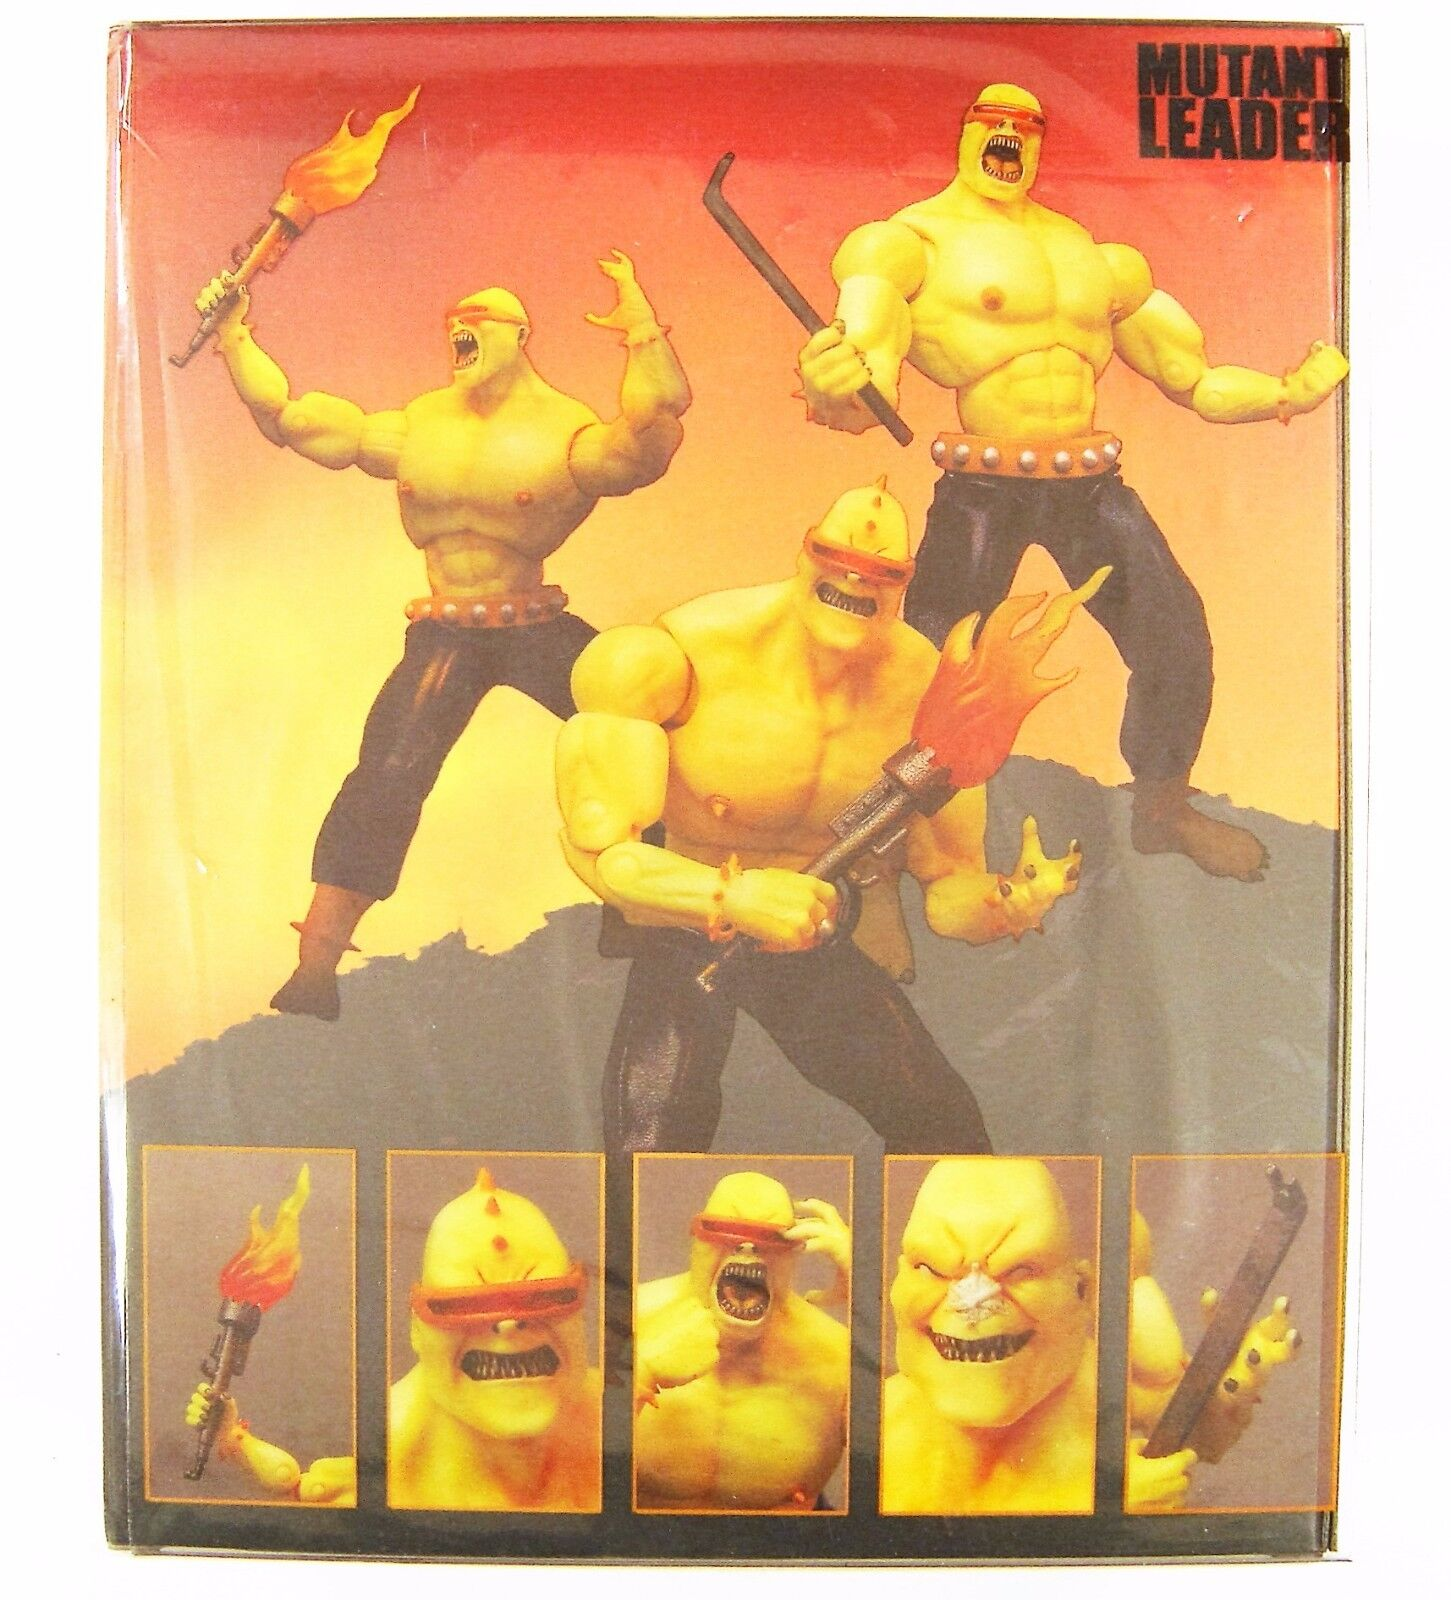 Batman Mutant Leader 1:12 Scale Toyz Action FigureMezco Toyz Scale 7b9dc9